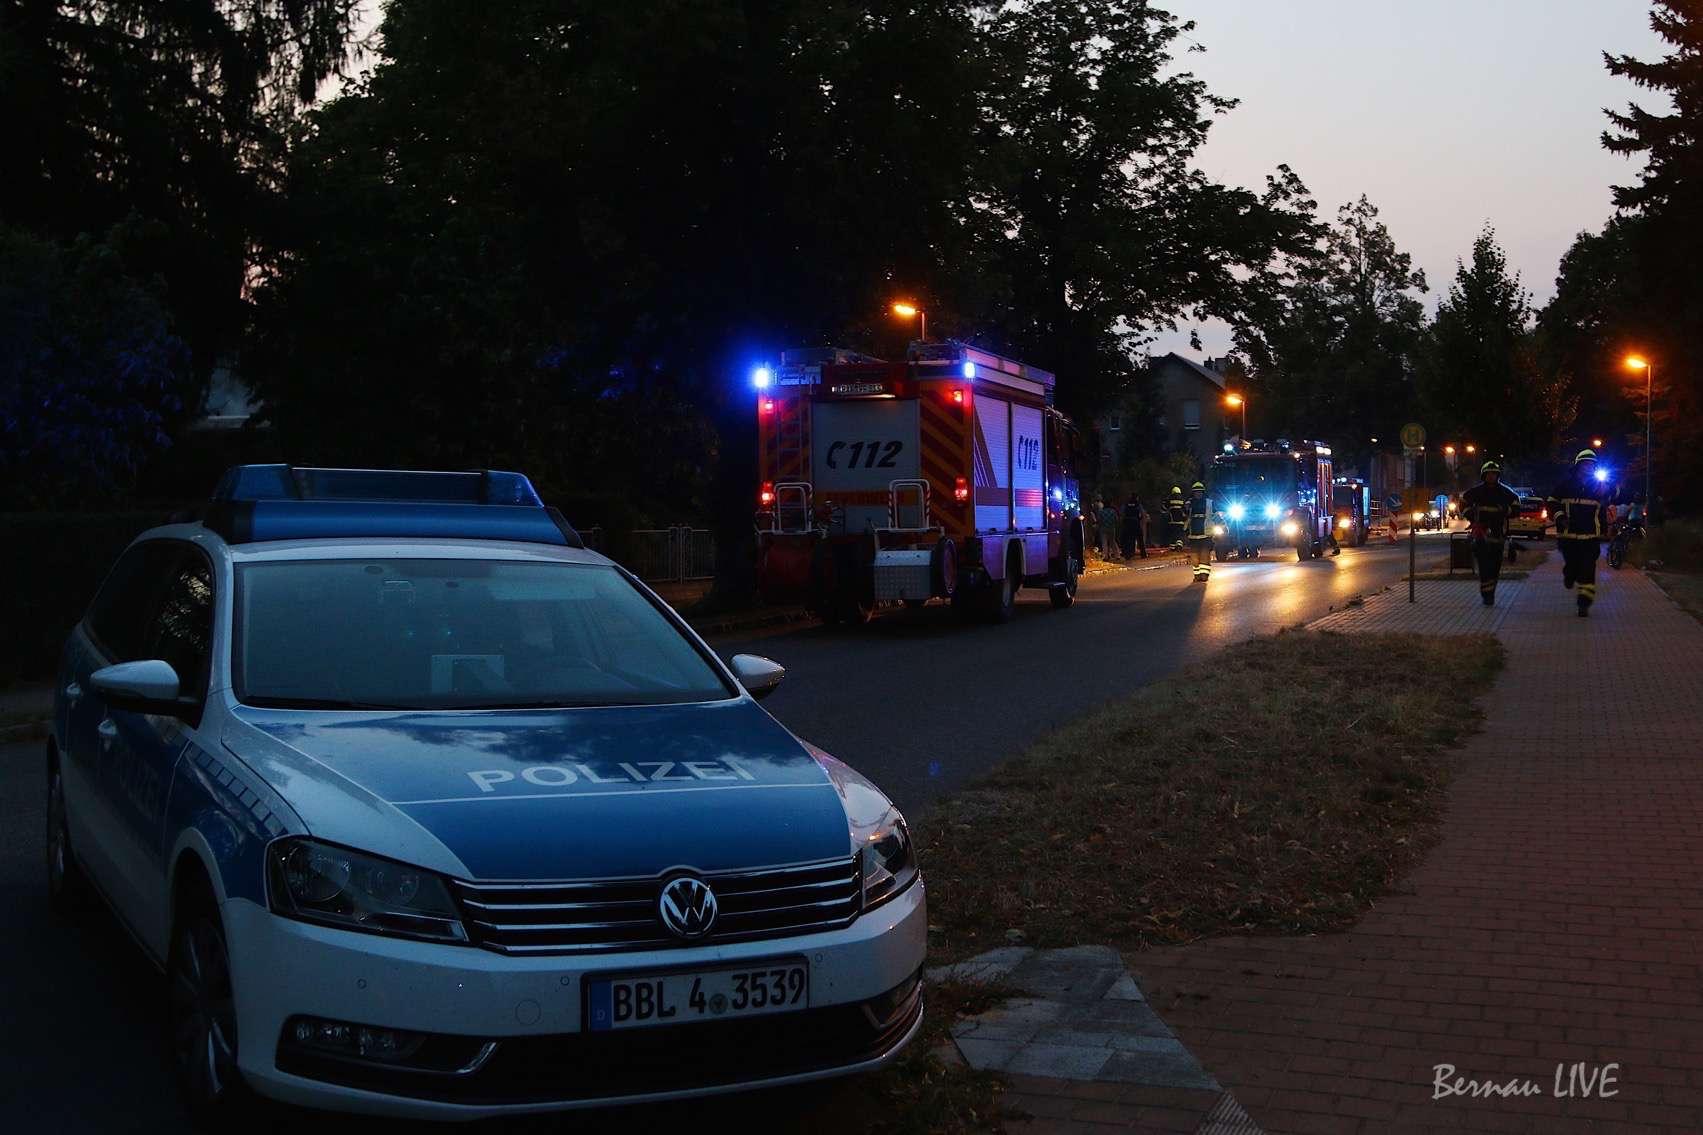 Bernau: Vermeintlicher Grossbrand in Ladeburg - Eberswalde